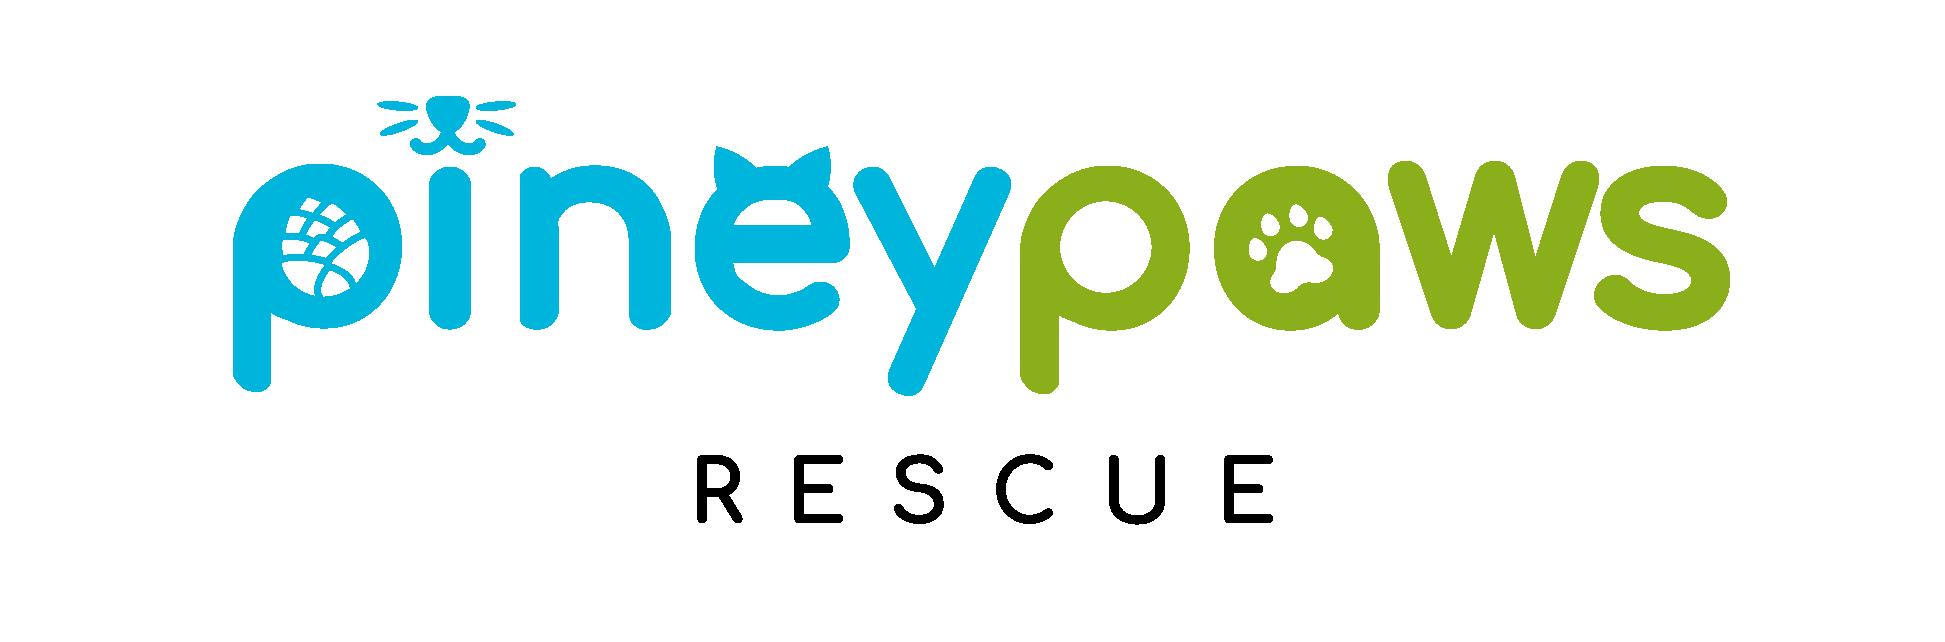 Help the tiny paws!  Piney Paws Rescue needs logo